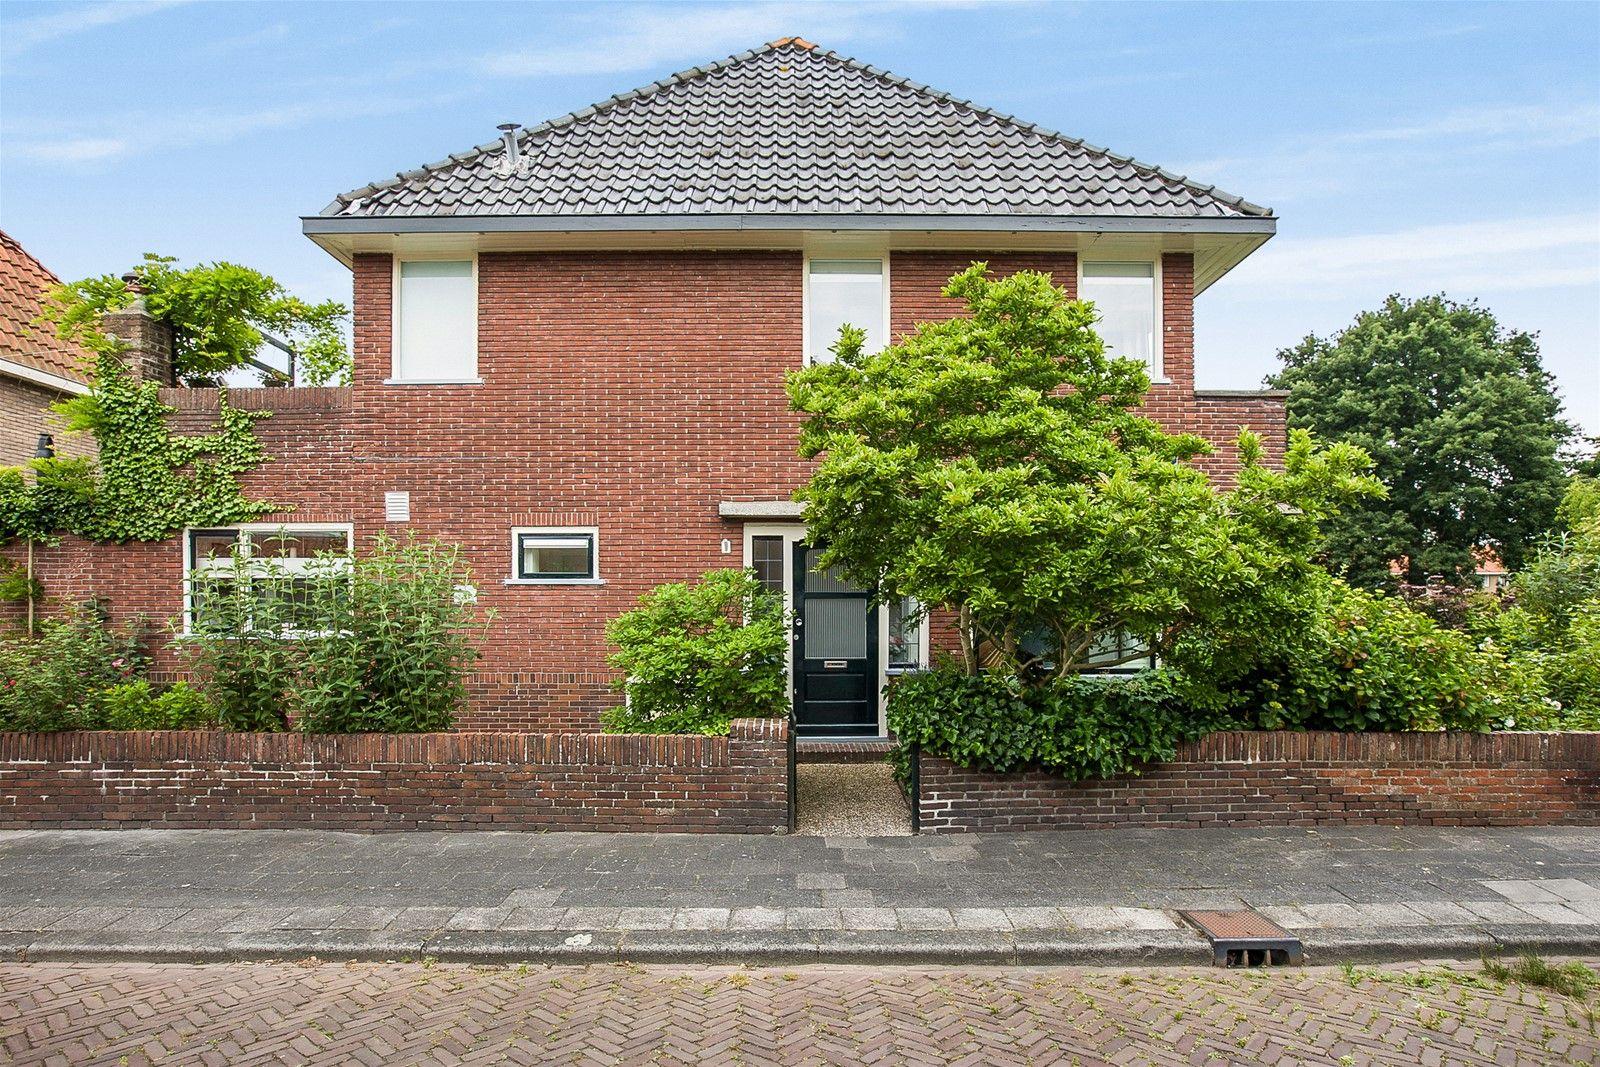 Nicolaas Tulpstraat 17, Leeuwarden